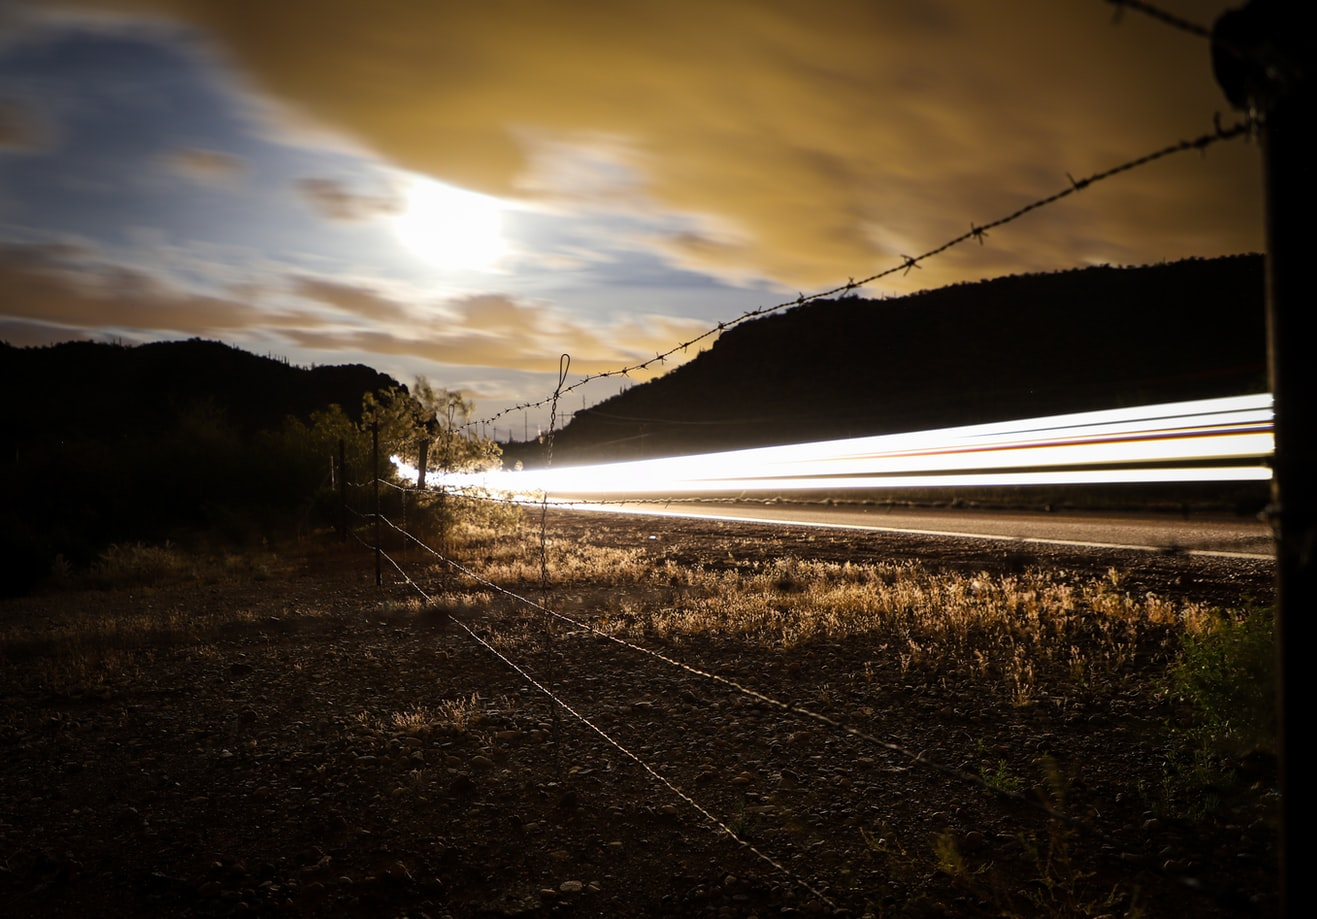 Belajar Fotografi #3: Shutter Speed (Kecepatan Rana)